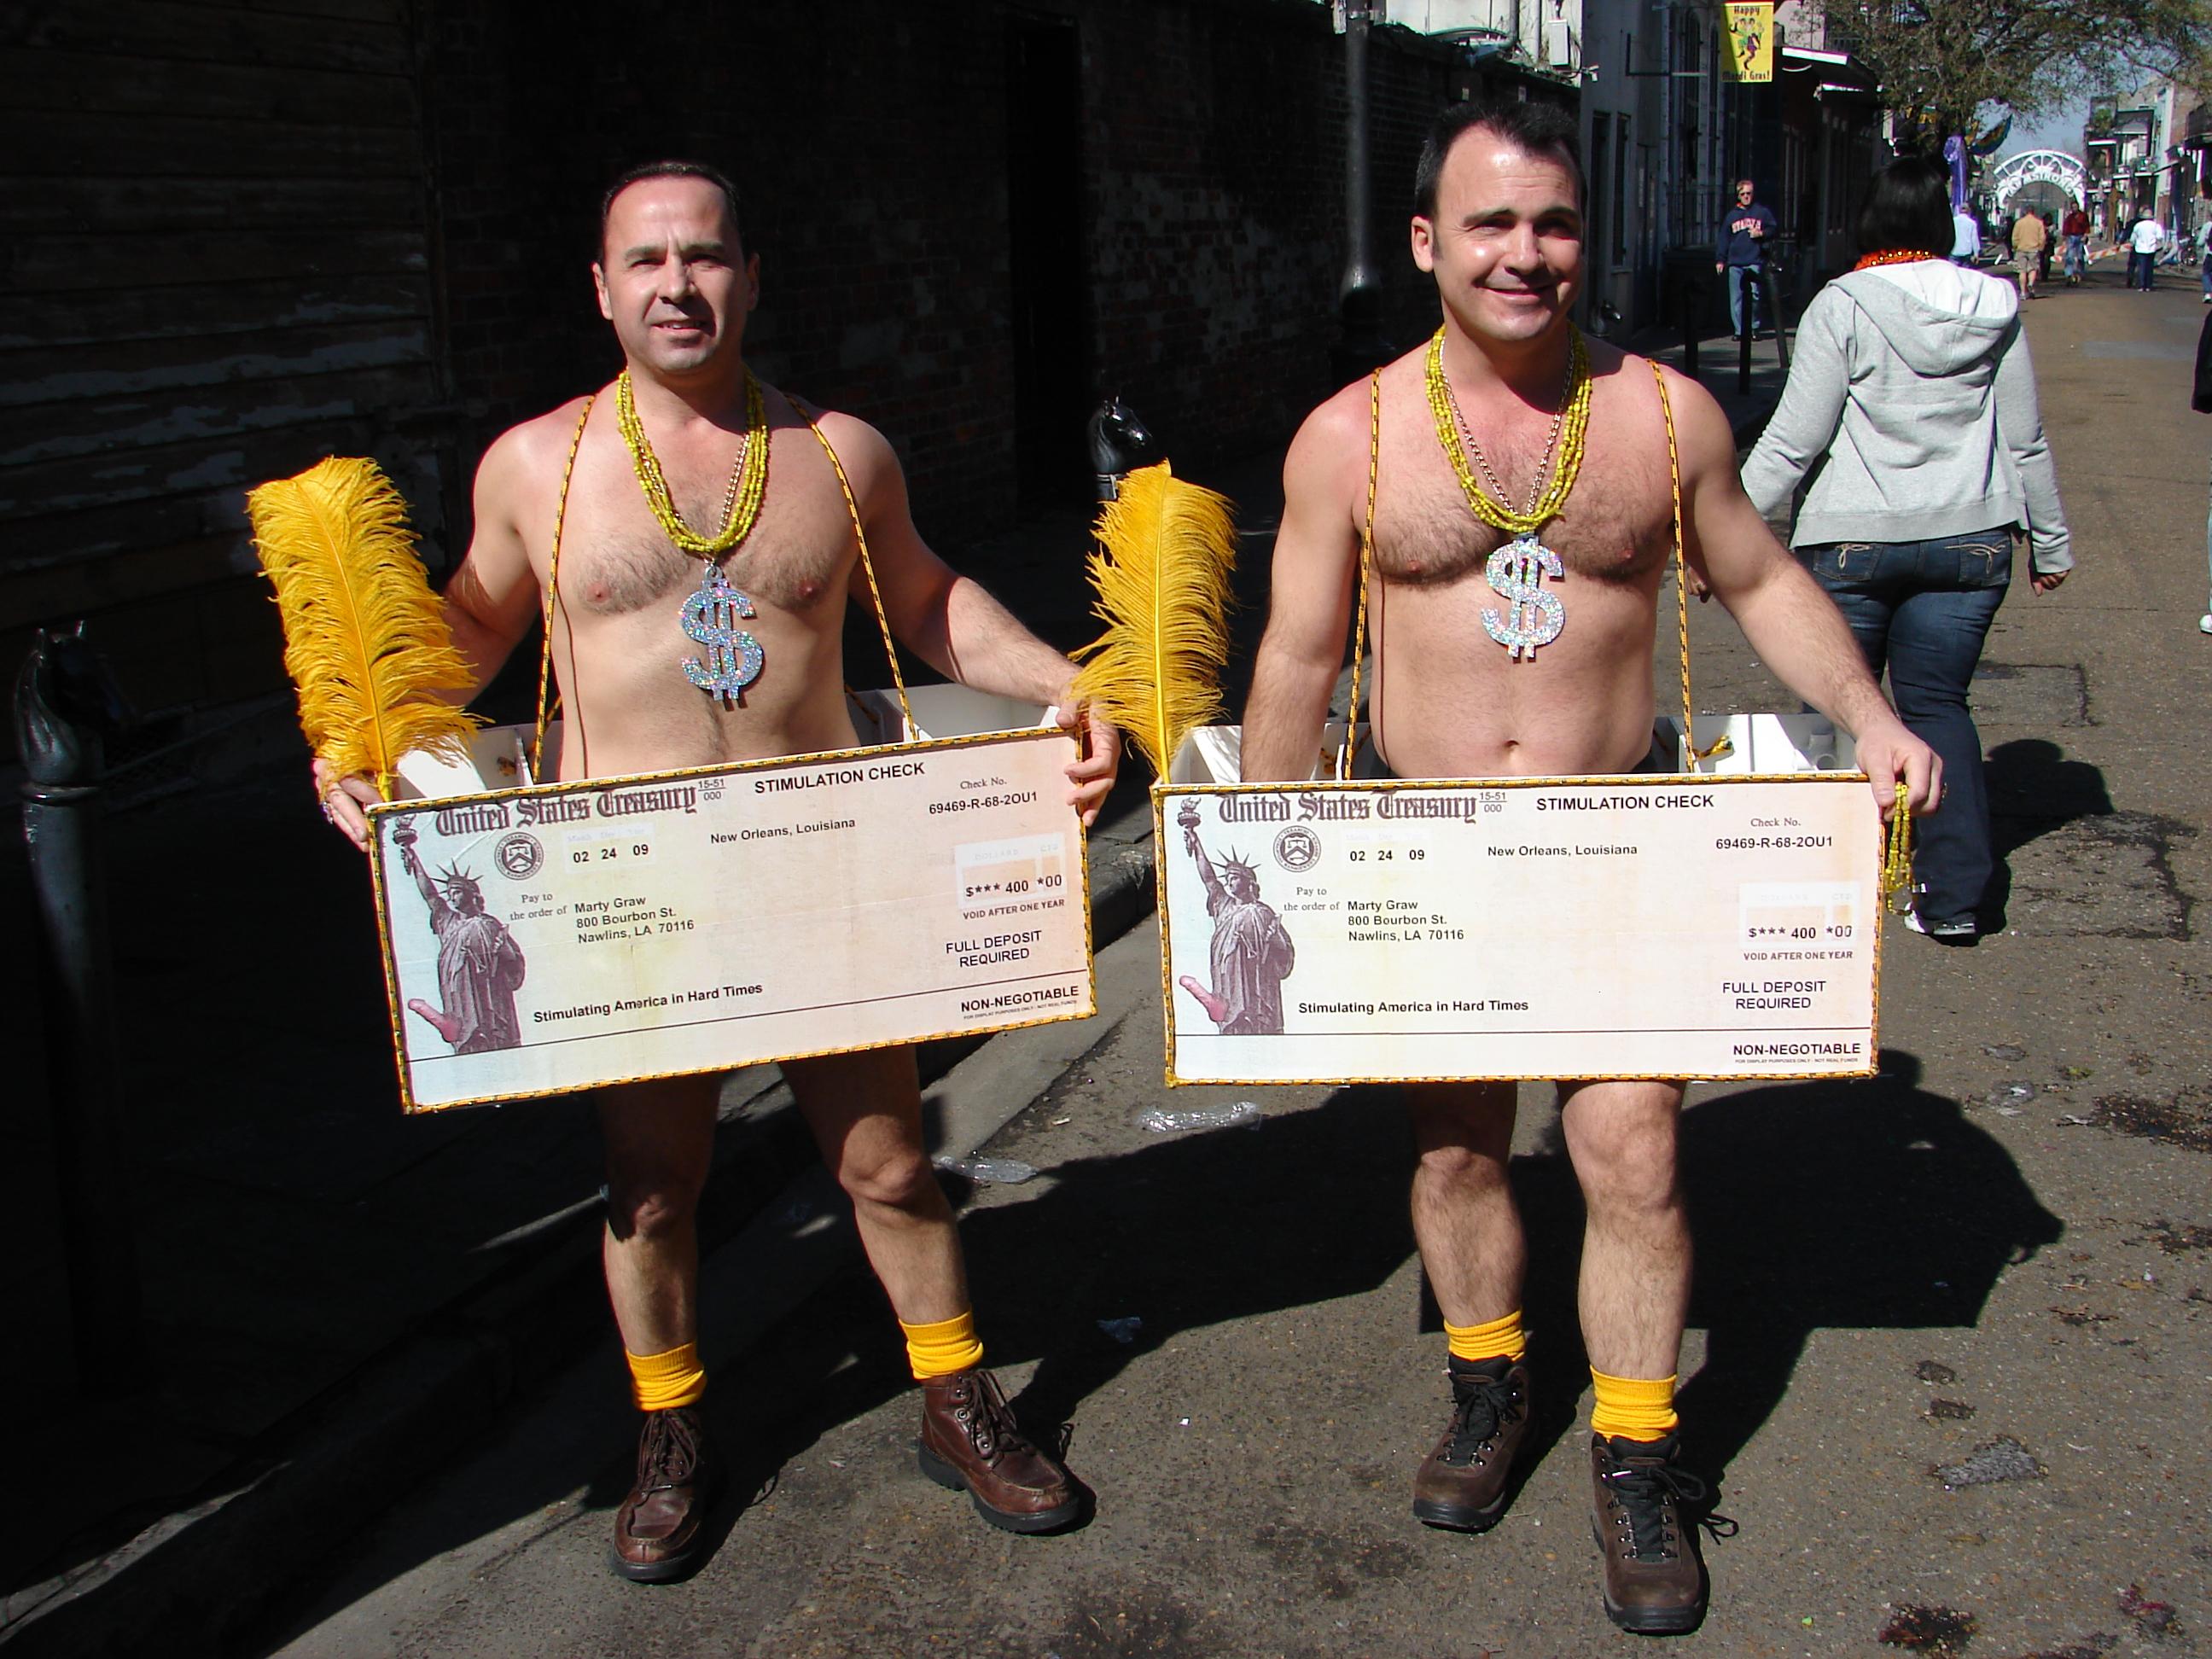 Stimulus Checks Mardi Gras 2009.jpg New Orleans Mardi Gras street revelers costumed as Stimulus Checks. Date 24 February 2009, 11:21:47 Source